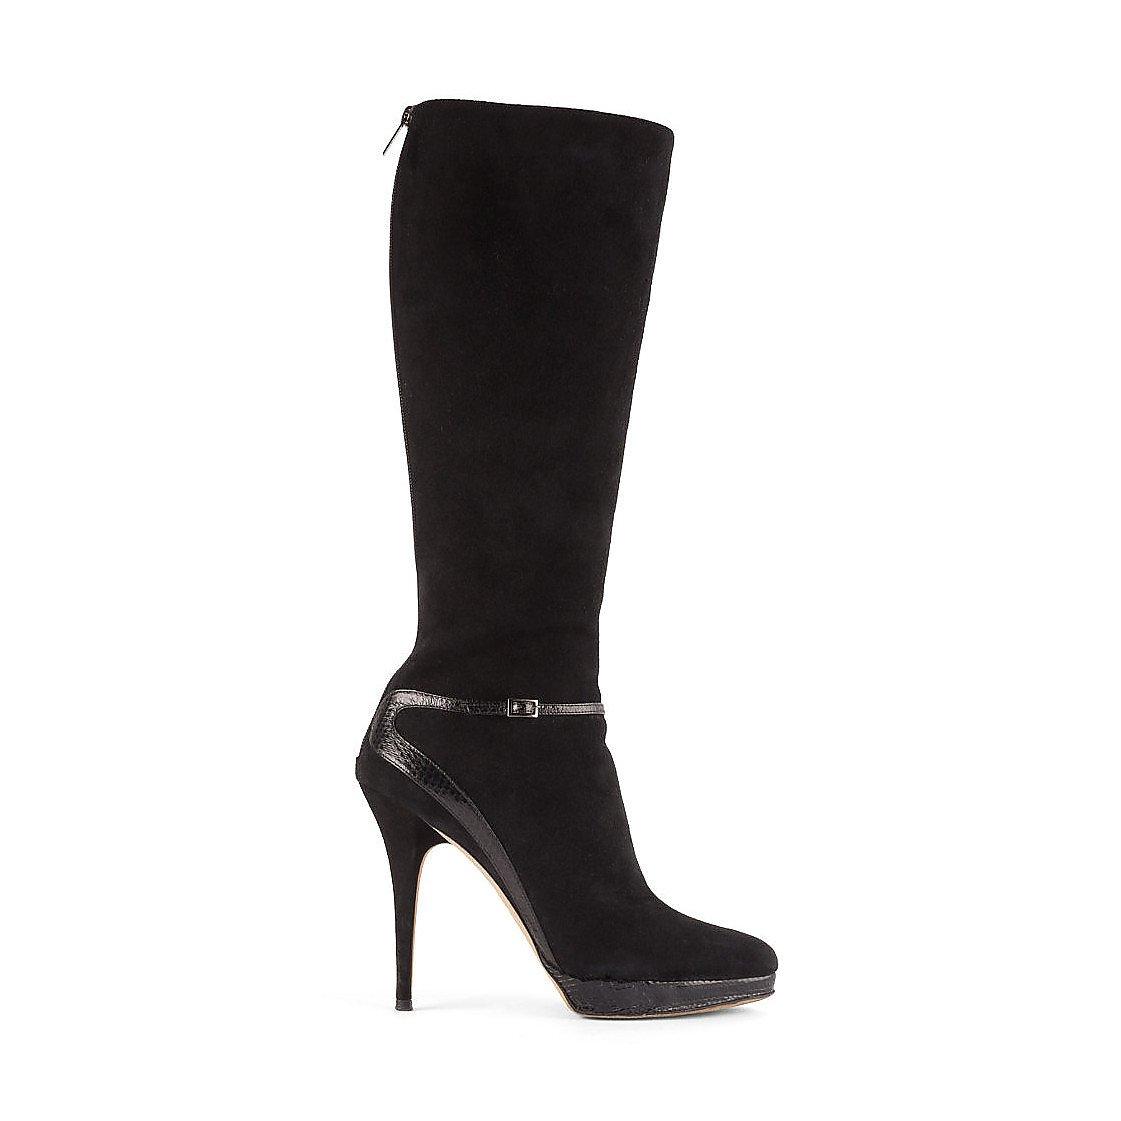 Jimmy Choo Suede Stiletto-Heel Platform Boots